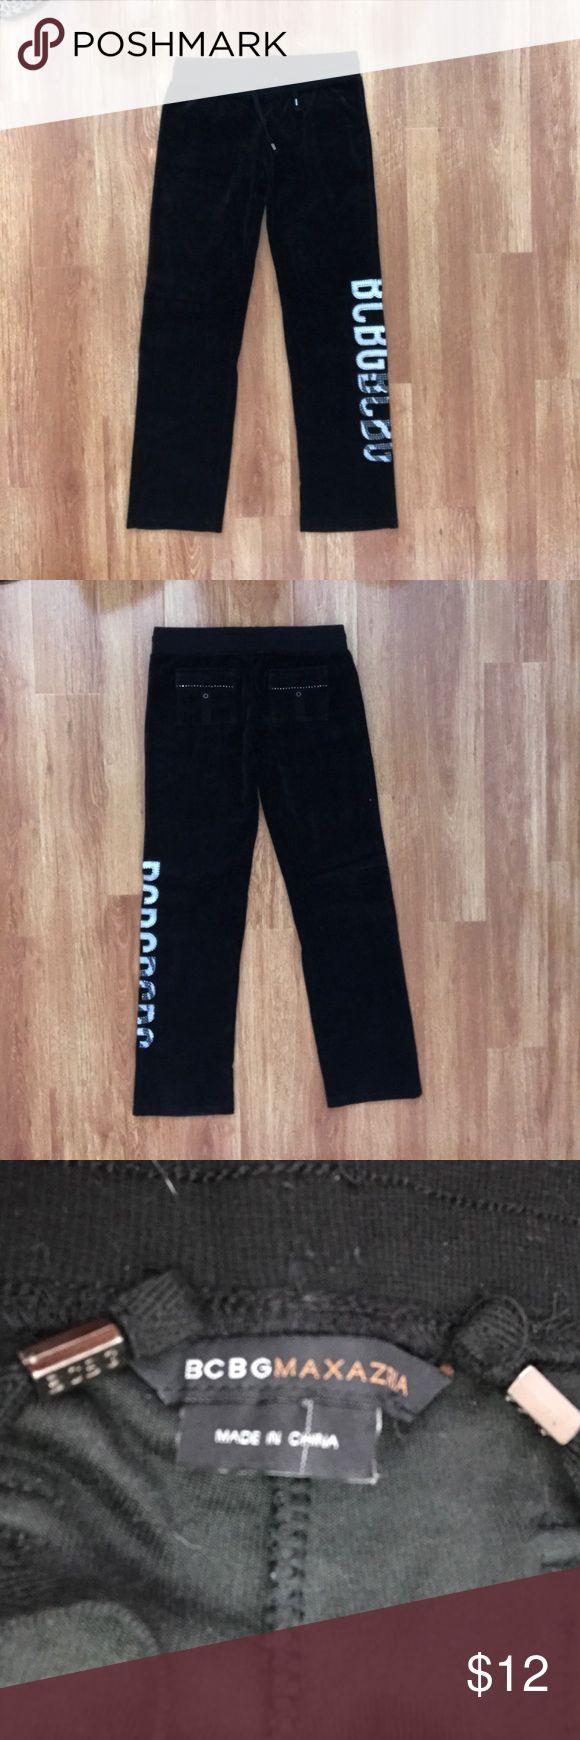 BCBG Valore Black Pants BGBC valore black pants. New without tags. Stud design on back pockets. BCBG Pants Jumpsuits & Rompers